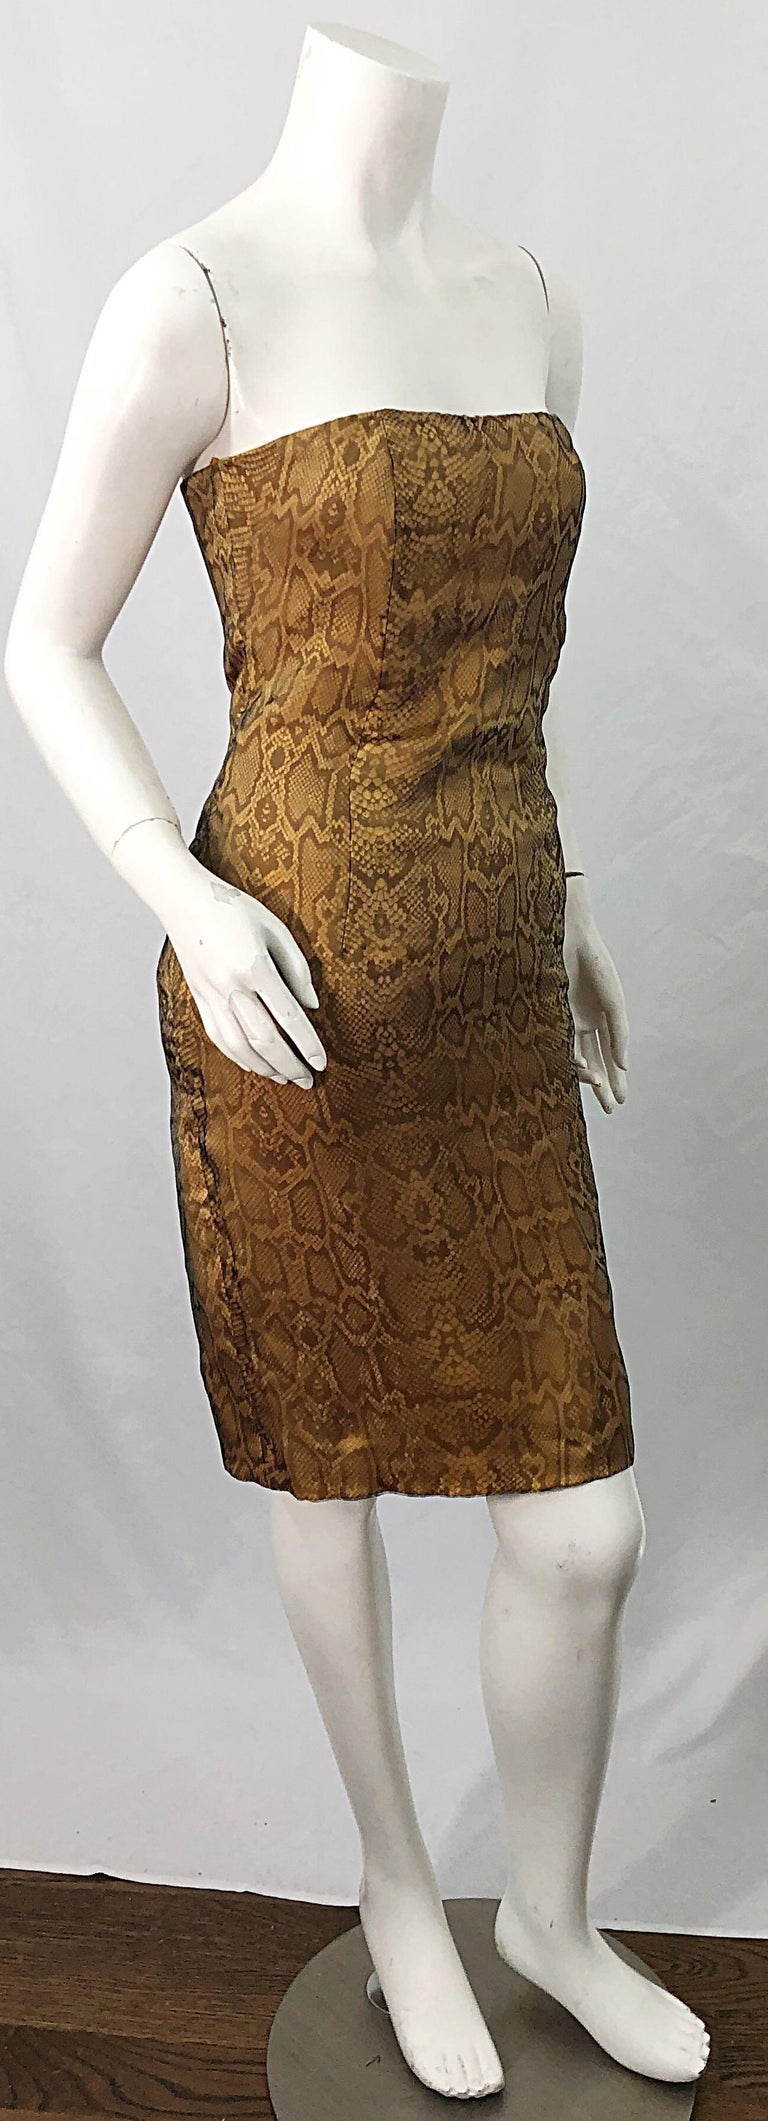 1990s Luca Luca Size 42 / 6 Snakeskin Silk Organza Strapless 90s Tan Brown Dress For Sale 3